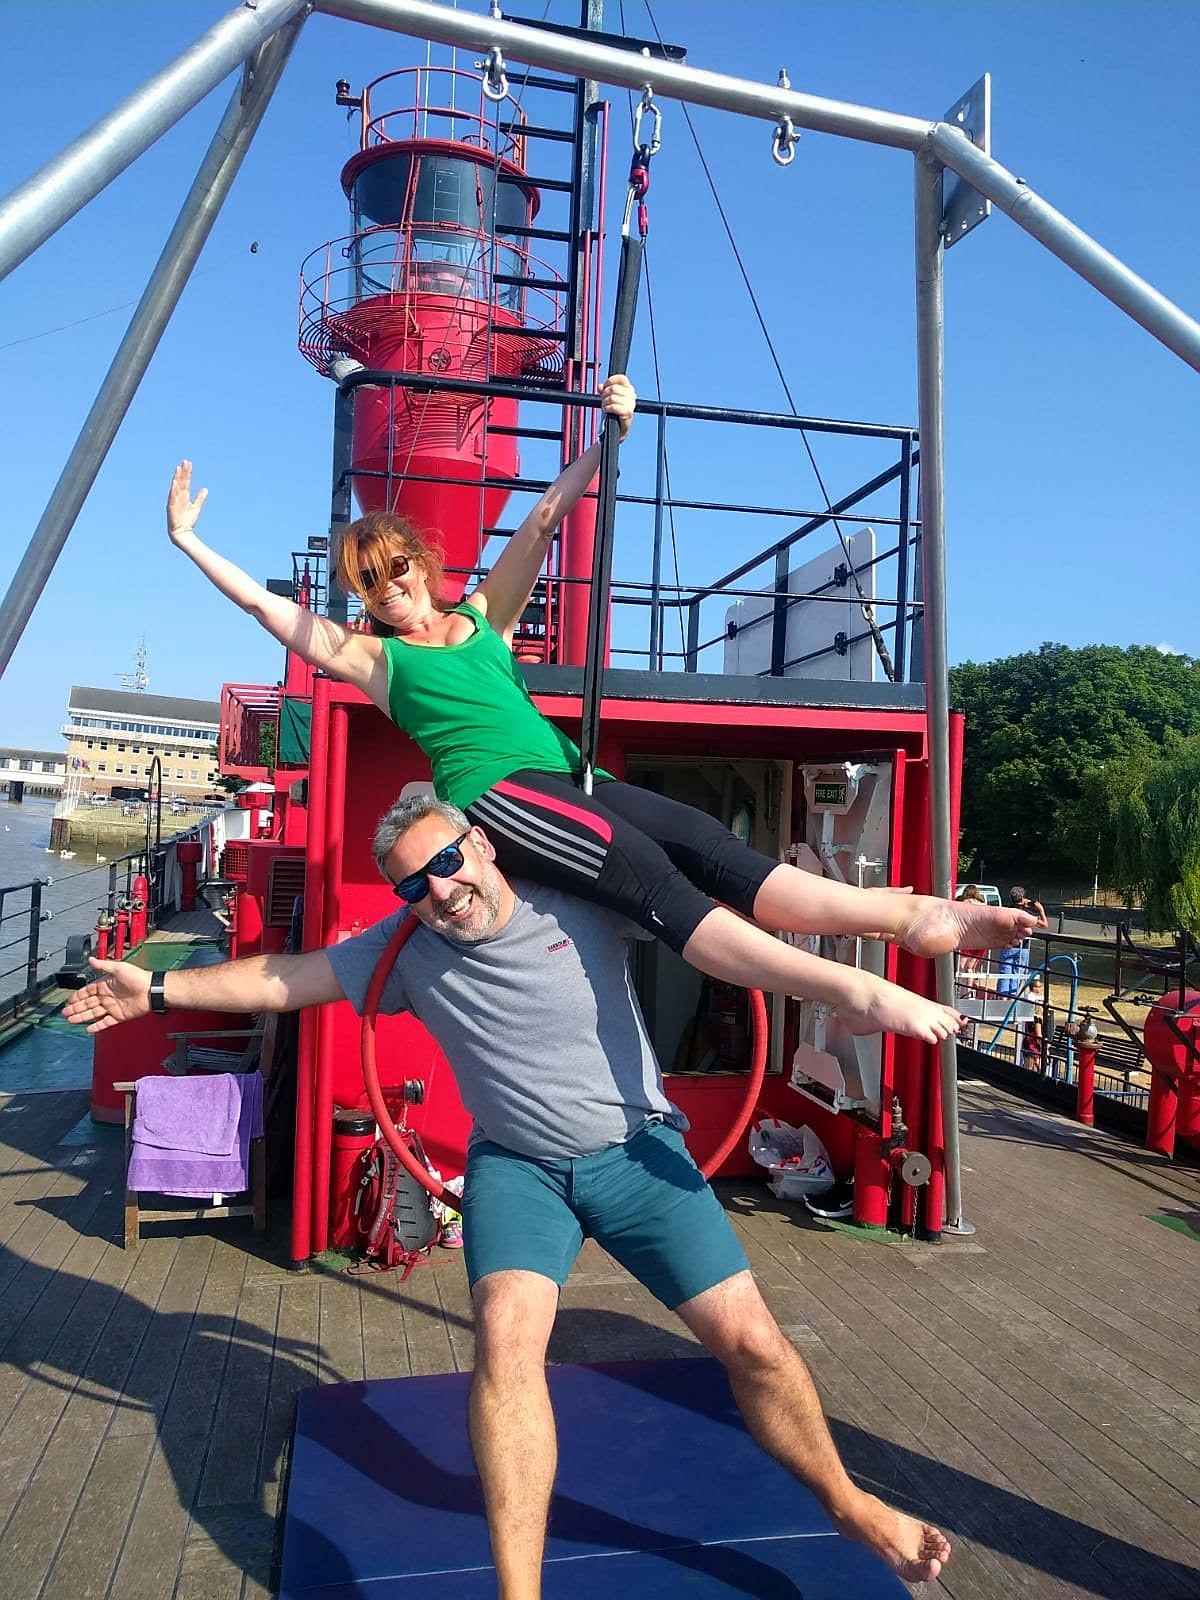 Steve and Shari share an aerial hoop. Both extend an arm and grin towards the camera.